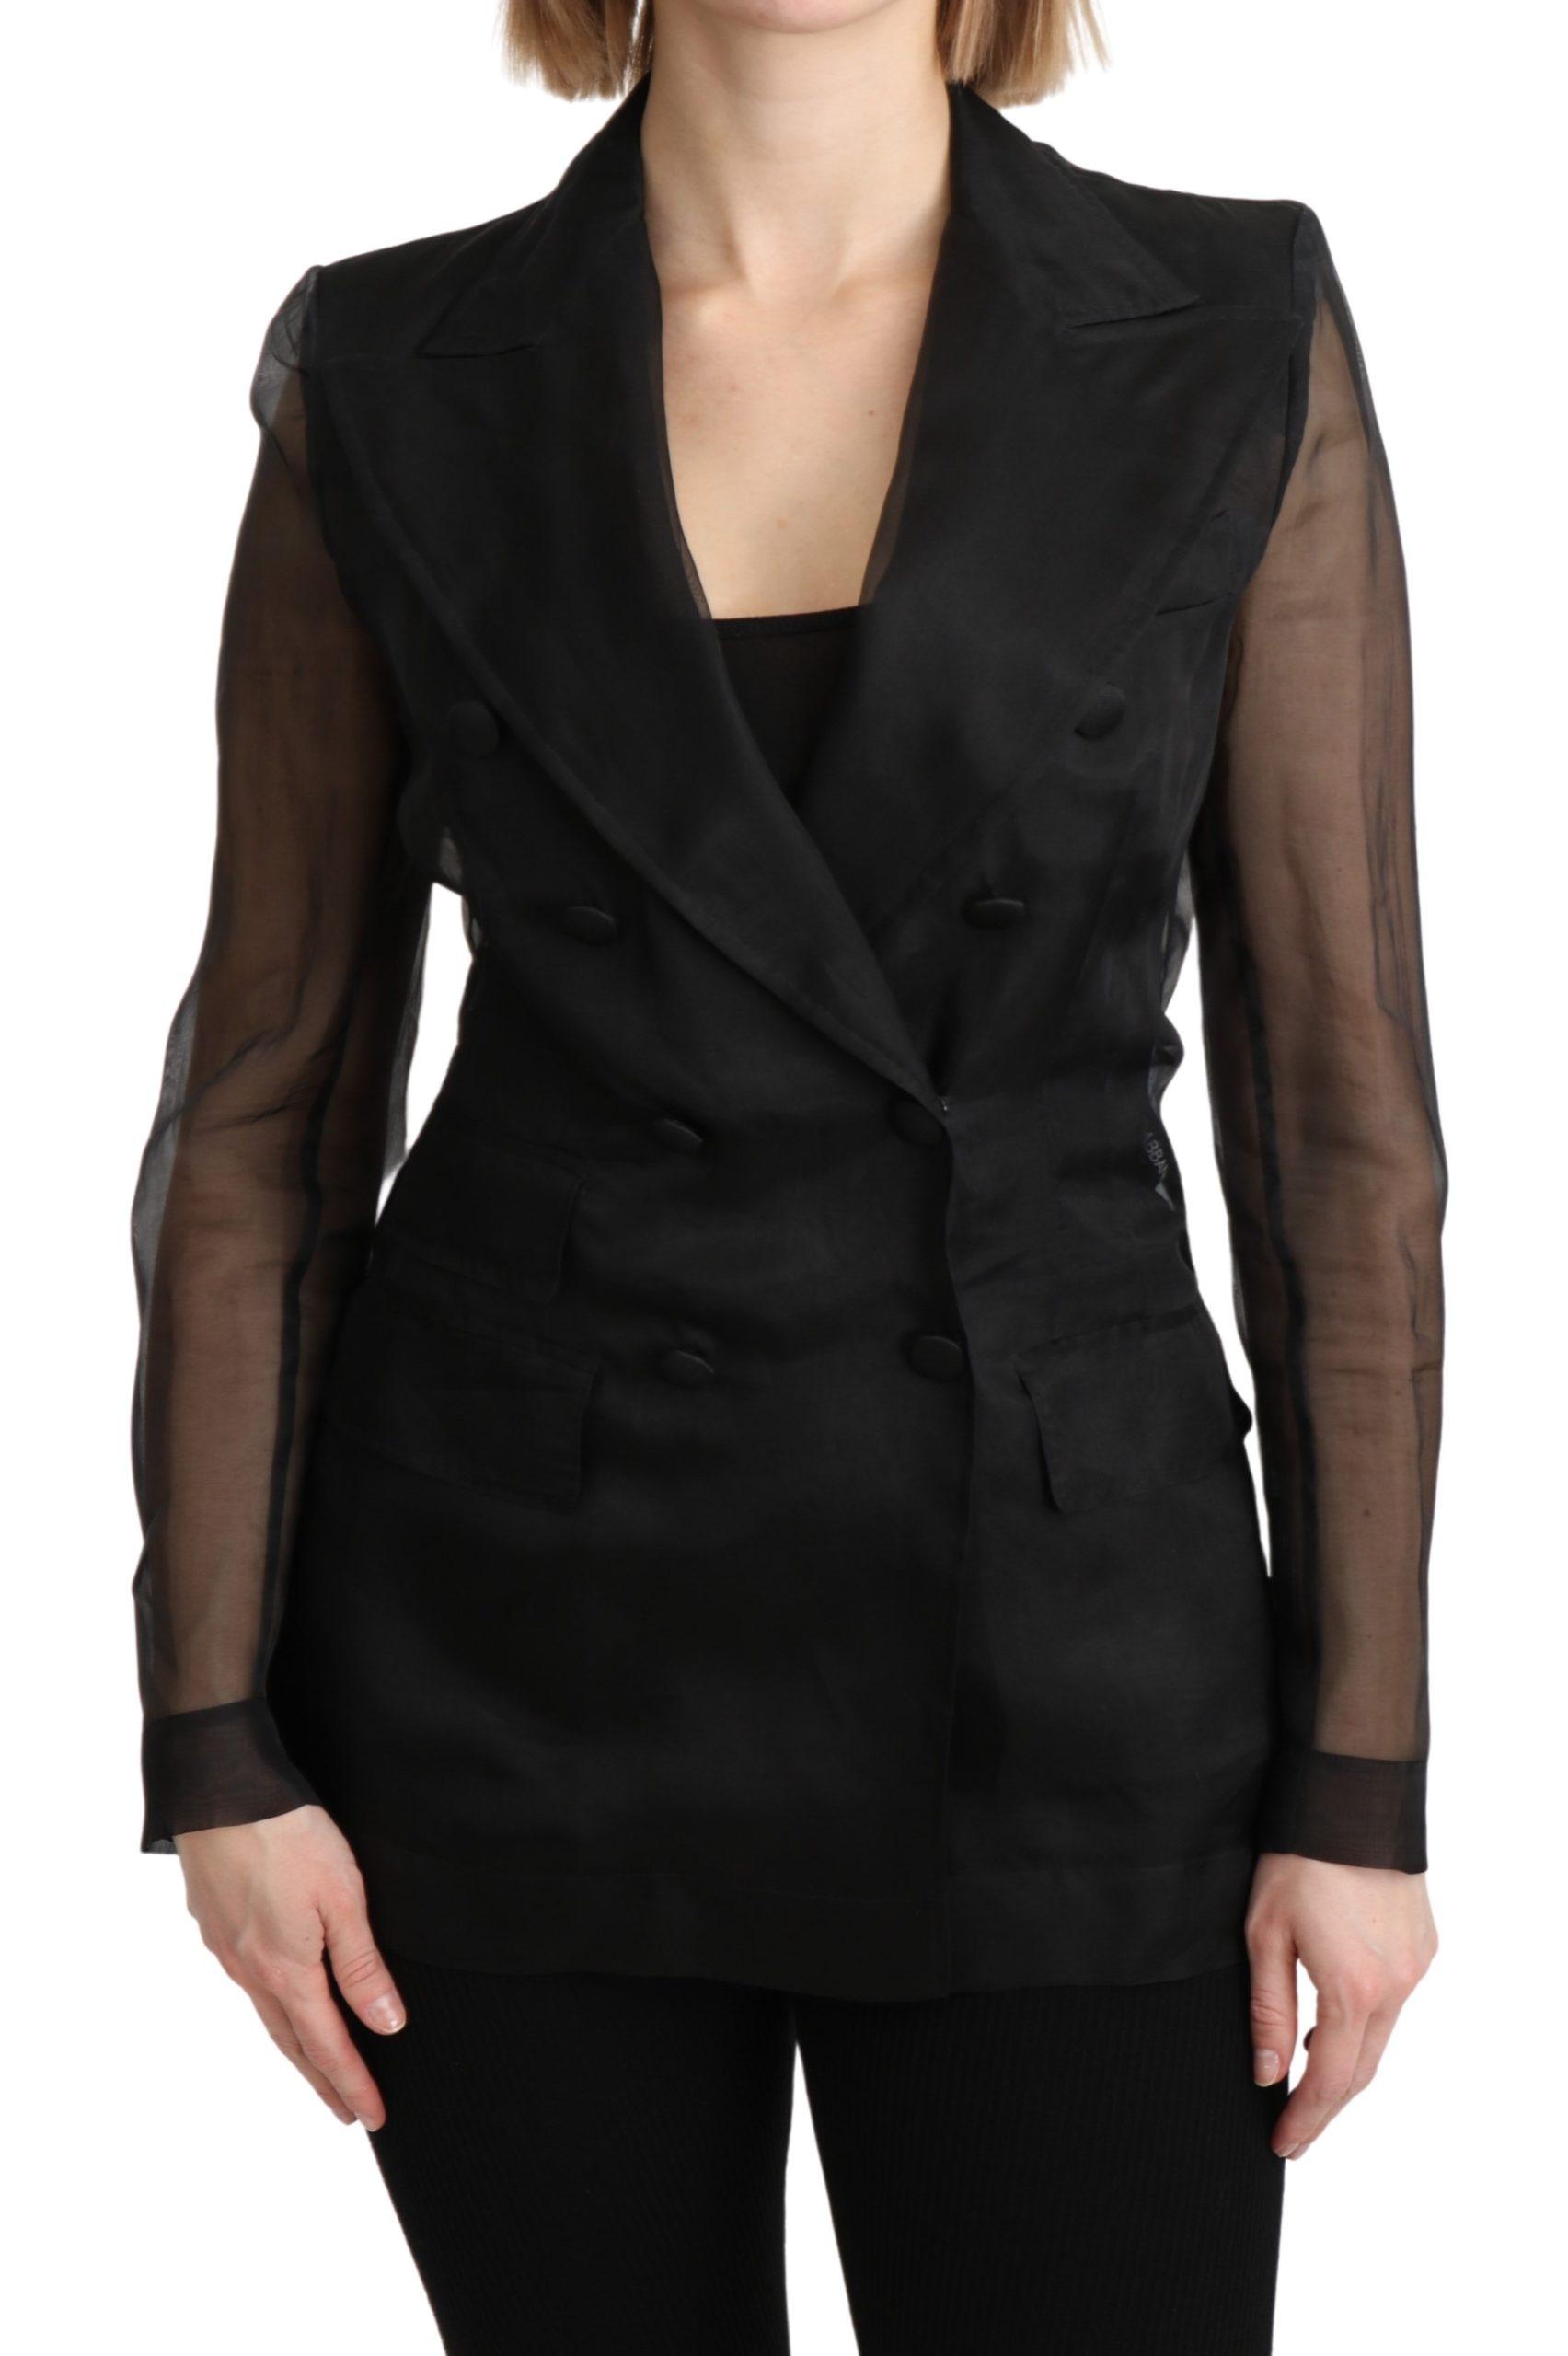 Dolce & Gabbana Women's Double Breasted Blazer Black KOS1797 - IT38|XS